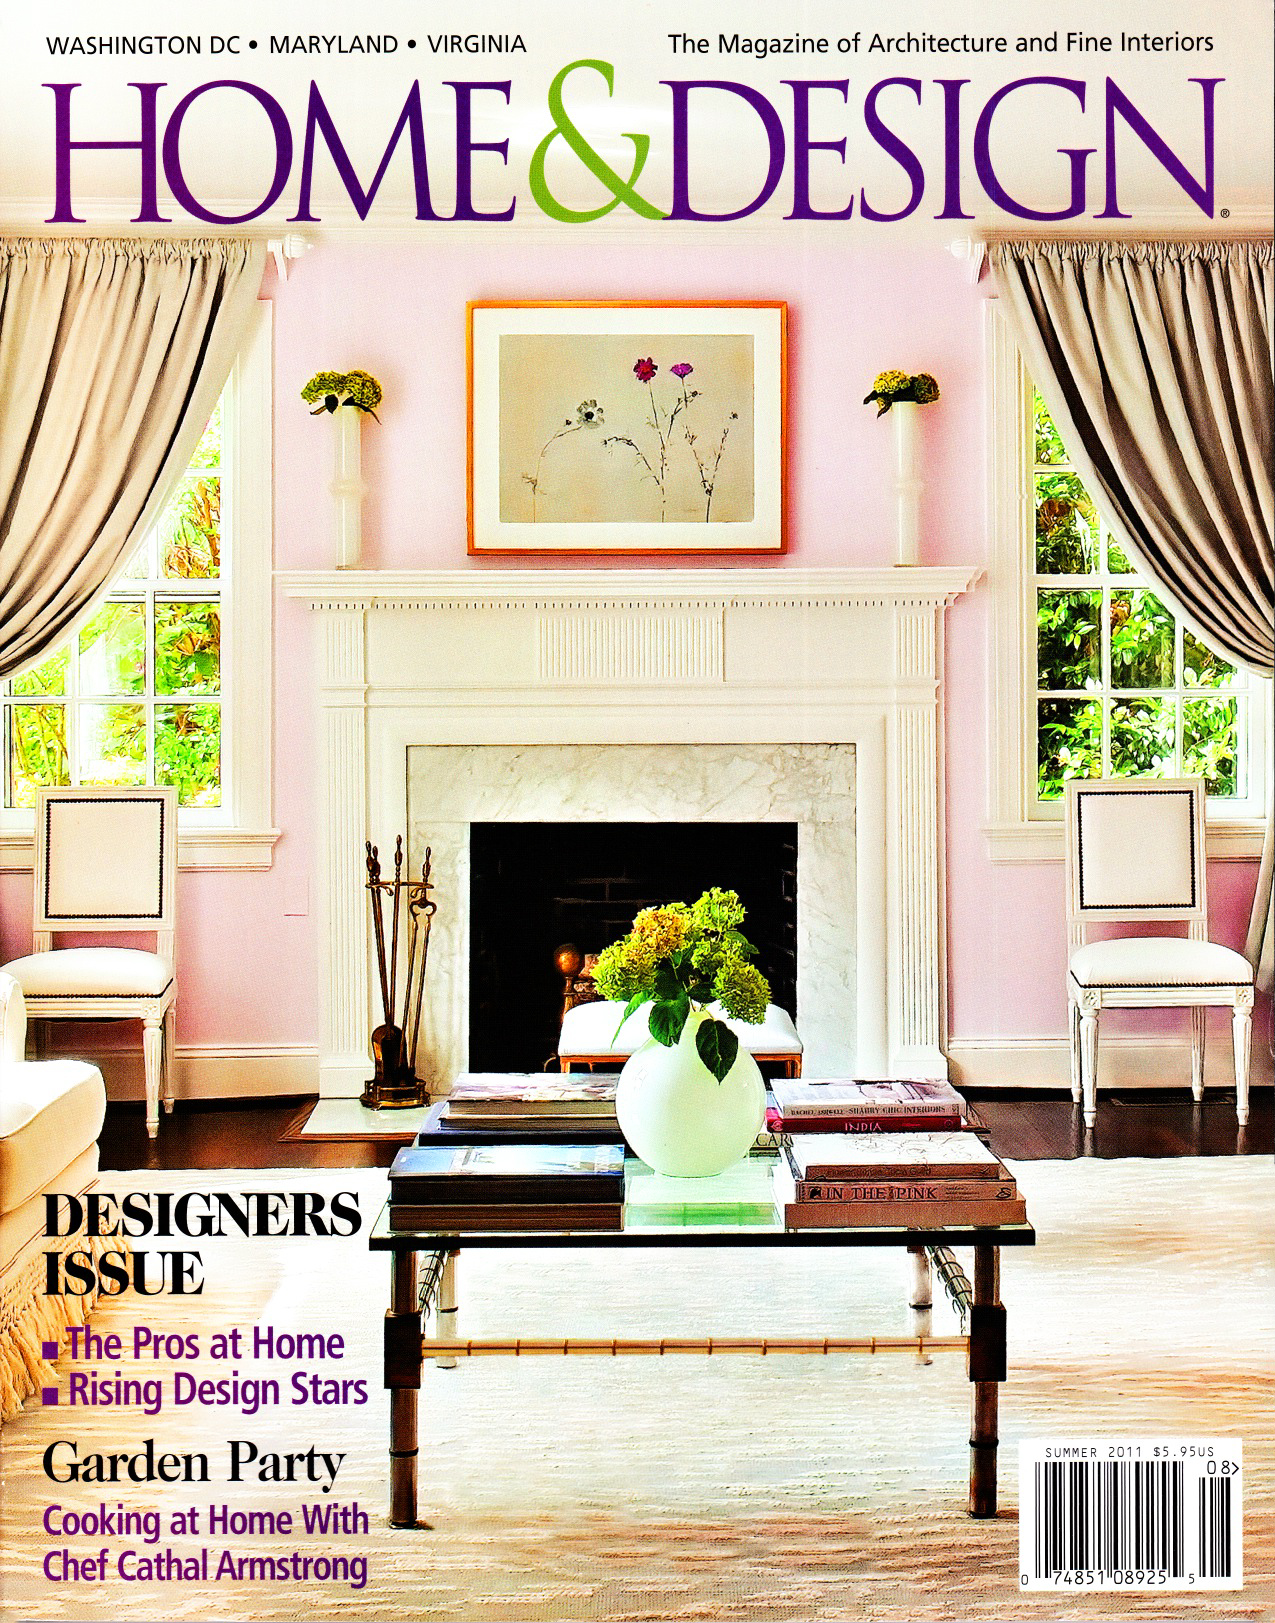 Home and Design Summer 2011.jpg